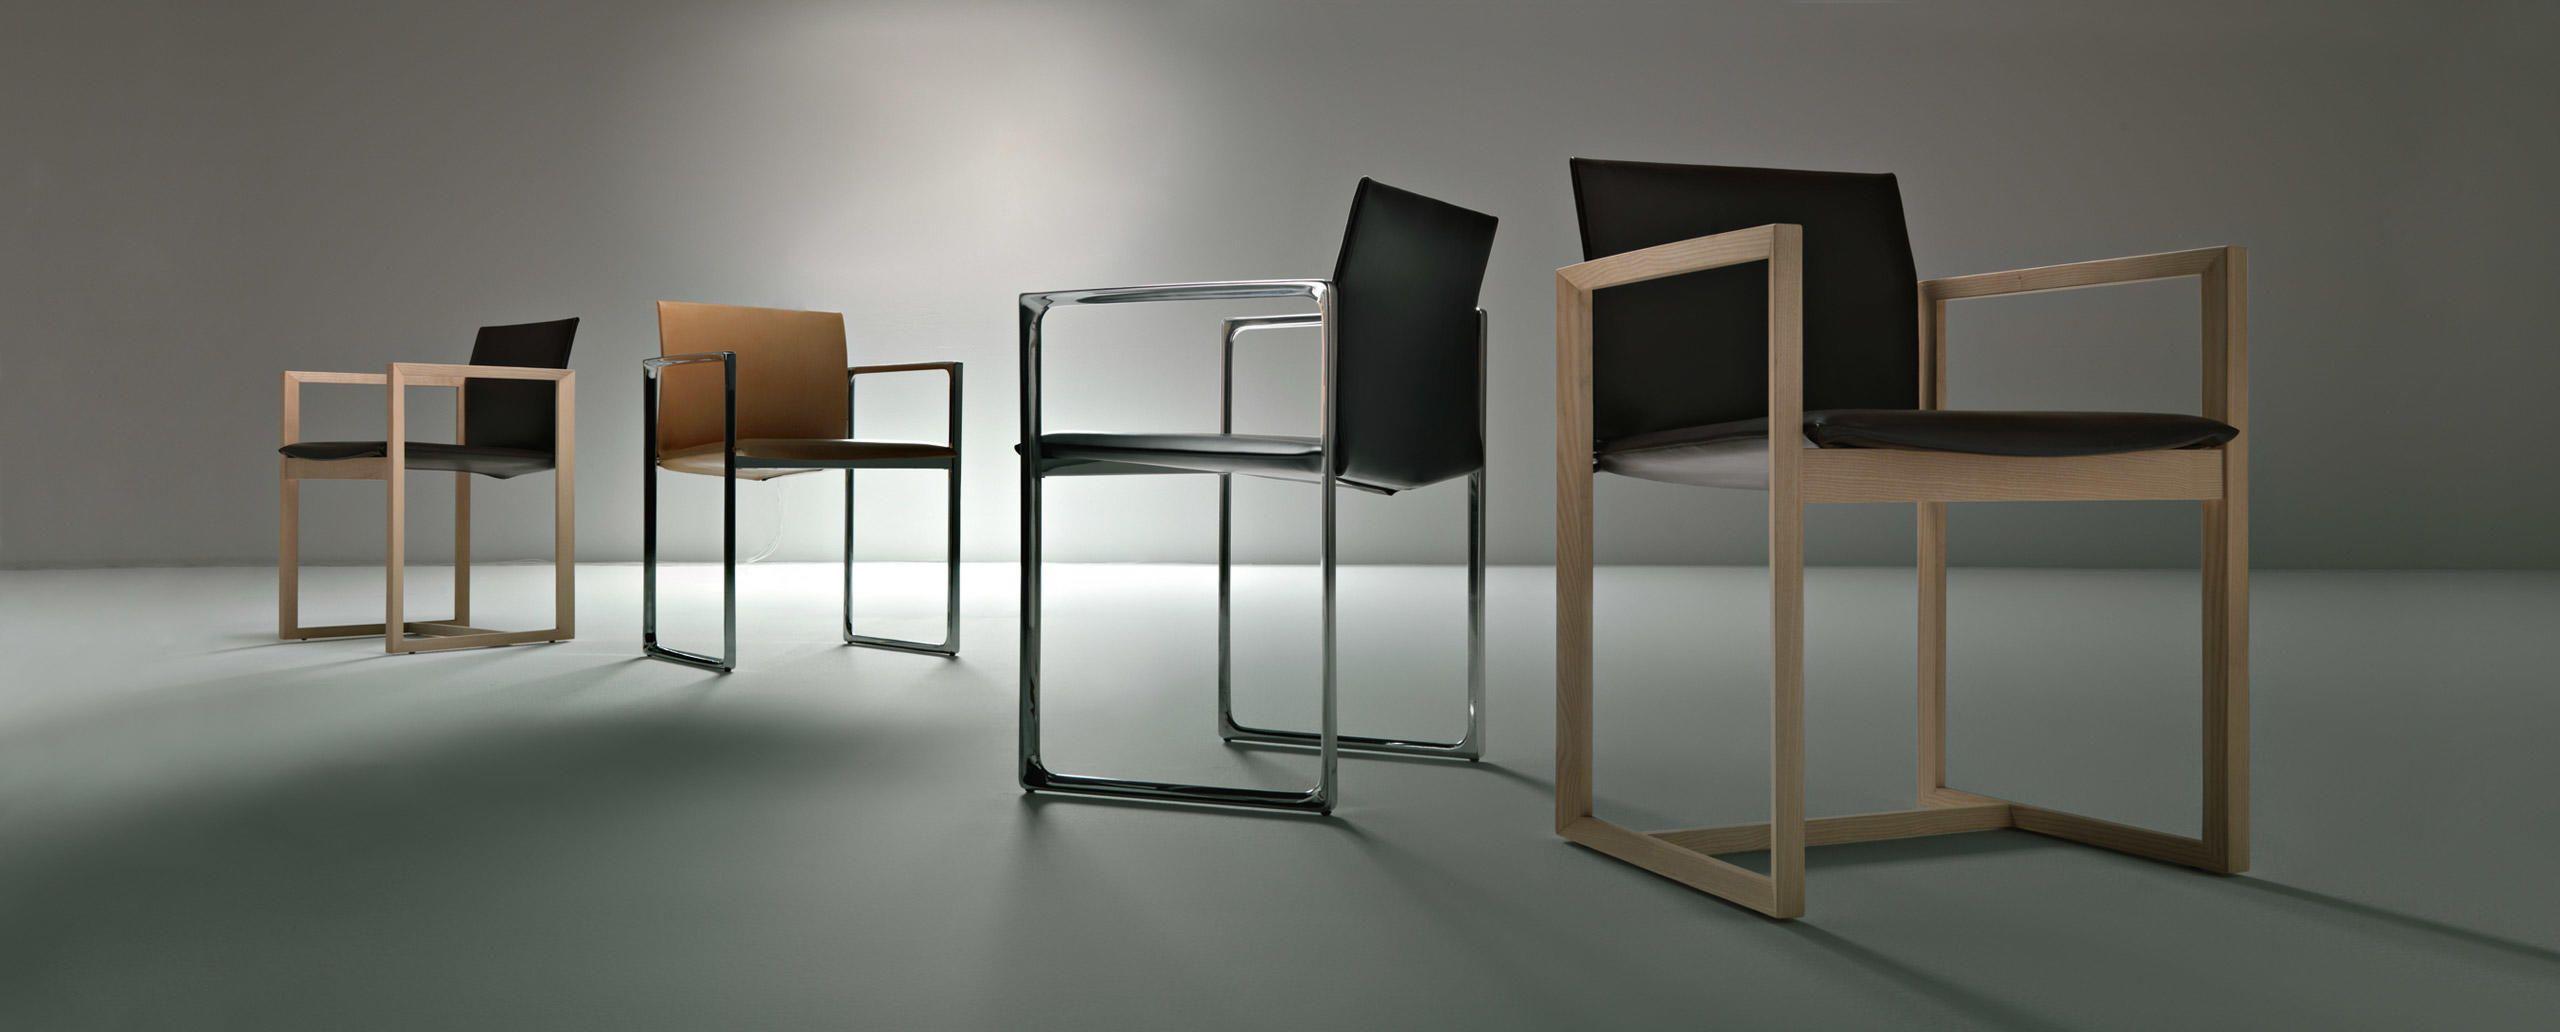 8102c6c615a814f99f1d18fa2fbe6358 Incroyable De Table Basse Le Corbusier Concept